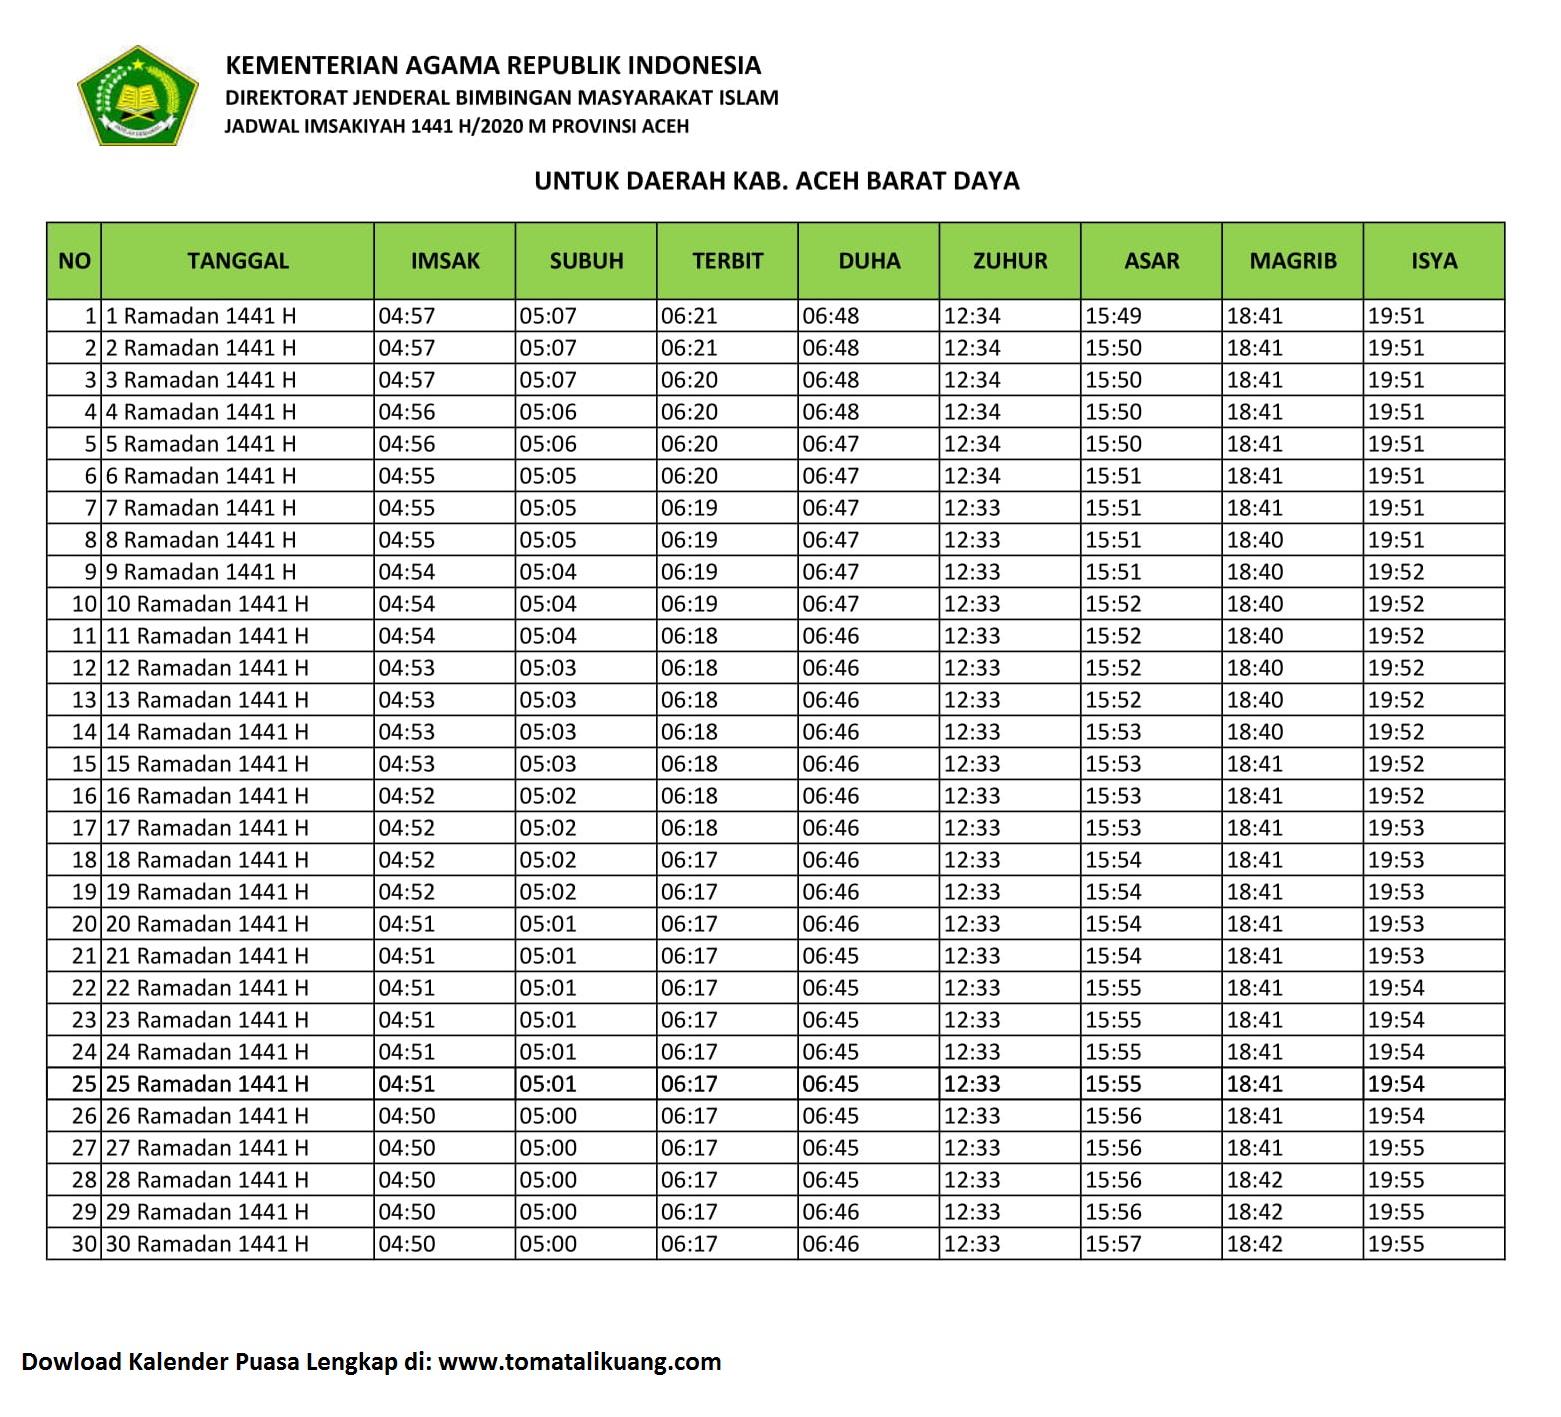 Jadwal Imsakiyah Buka Puasa Kab Aceh Barat Daya 2020 1441 H Kalender Puasa Ramadhan